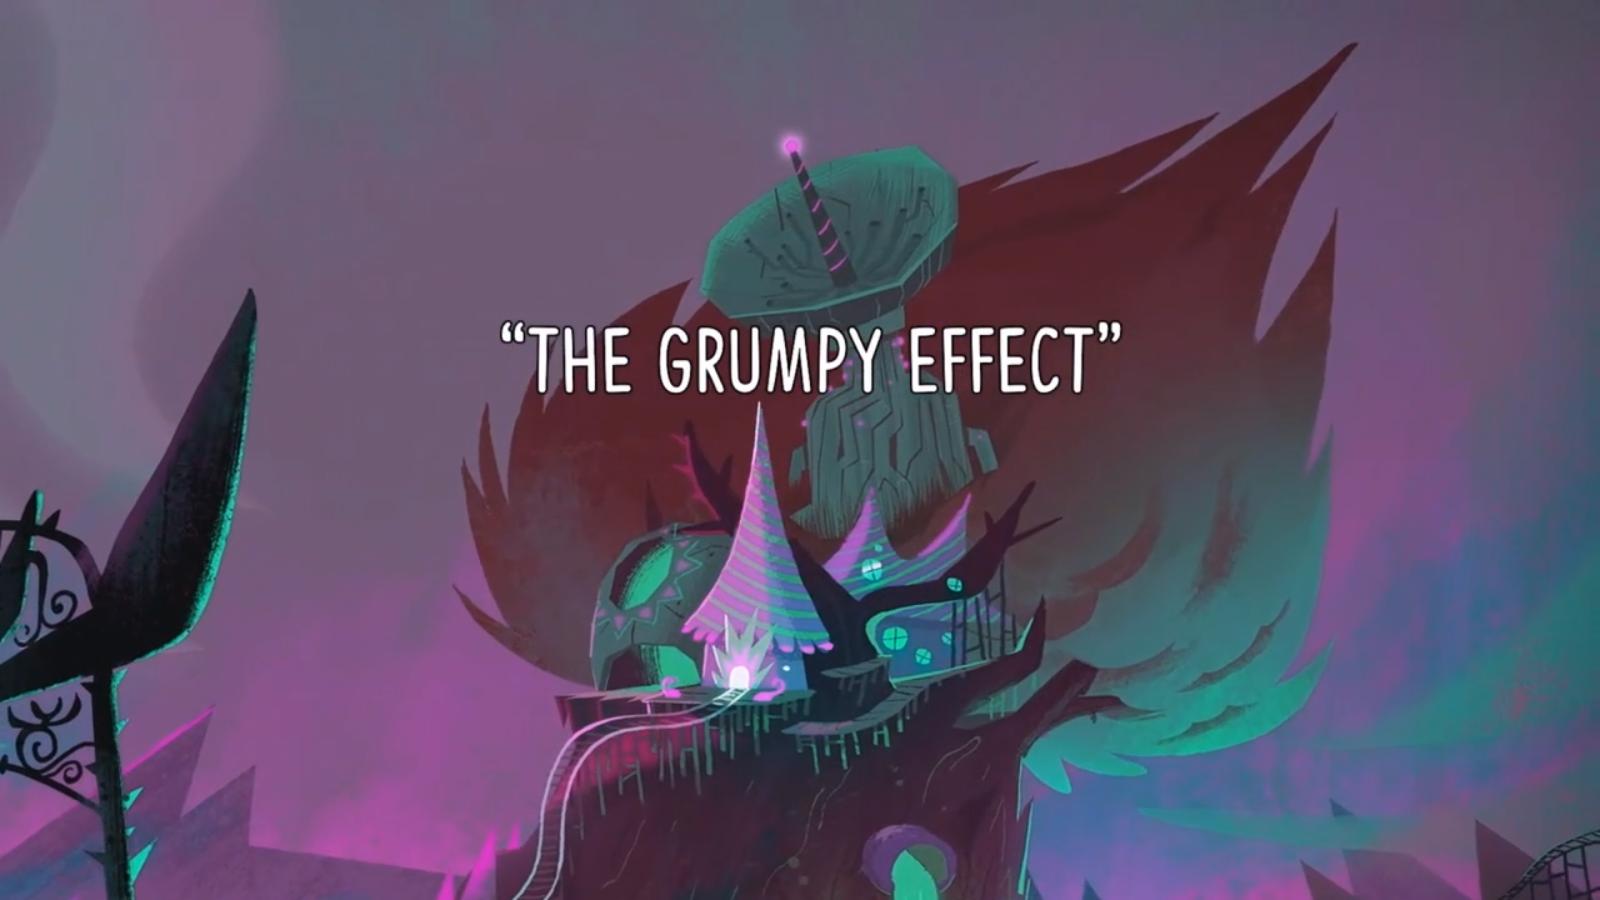 The Grumpy Effect